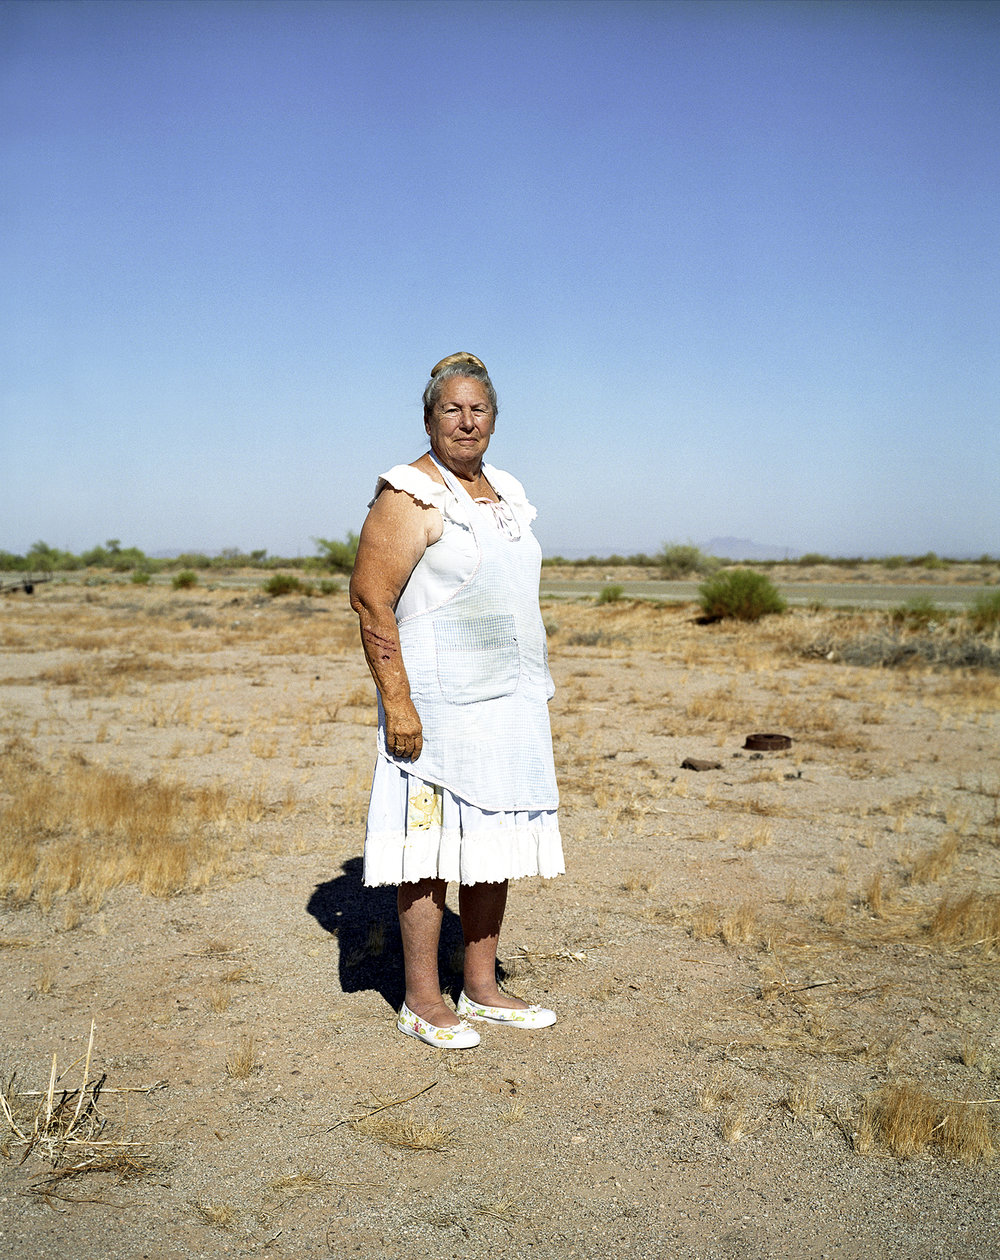 Dottie - Wellton, Arizona